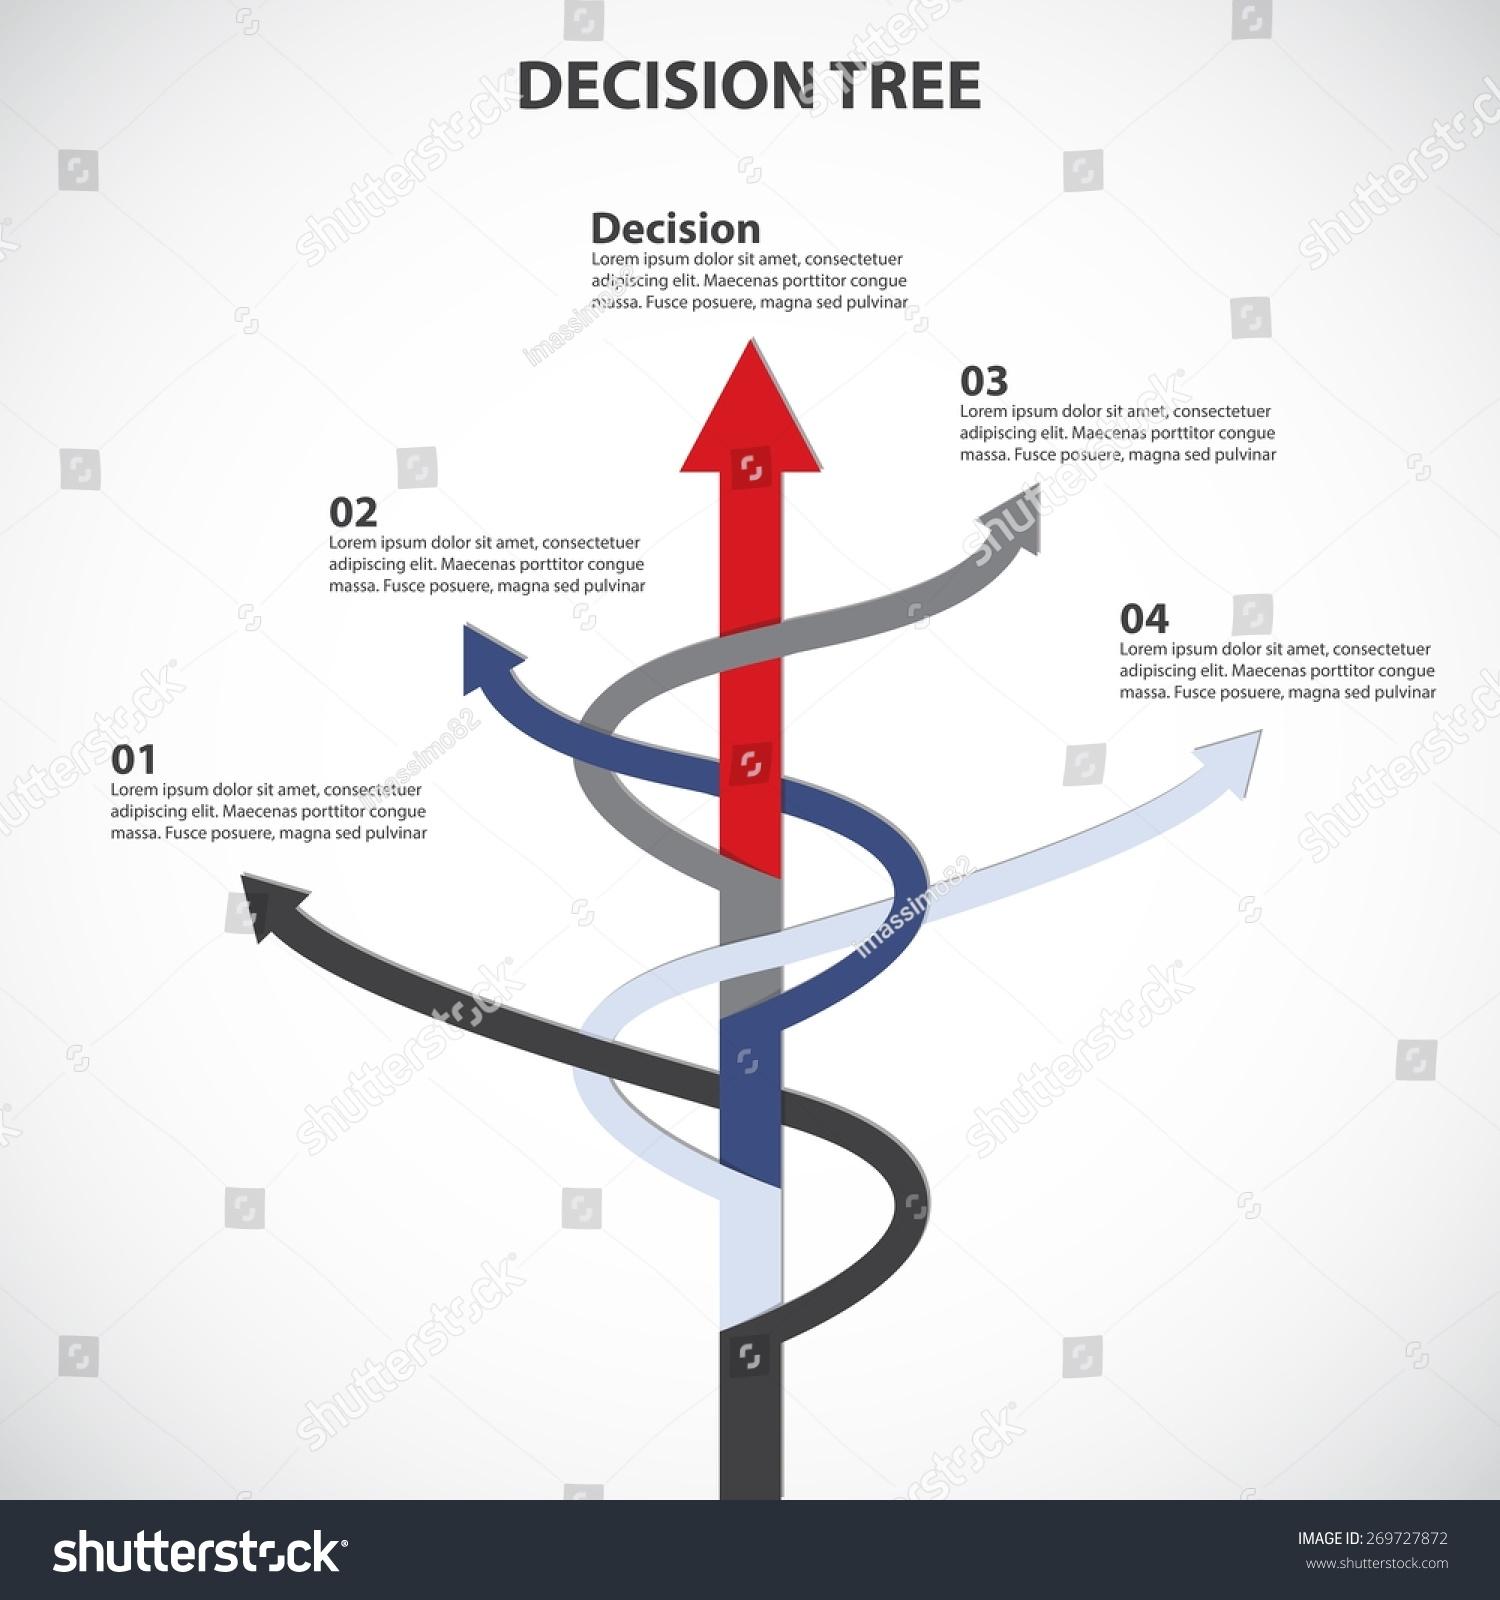 shrub graphic symbols diagram toyota land cruiser headlight wiring decision tree chart vector infographic stock